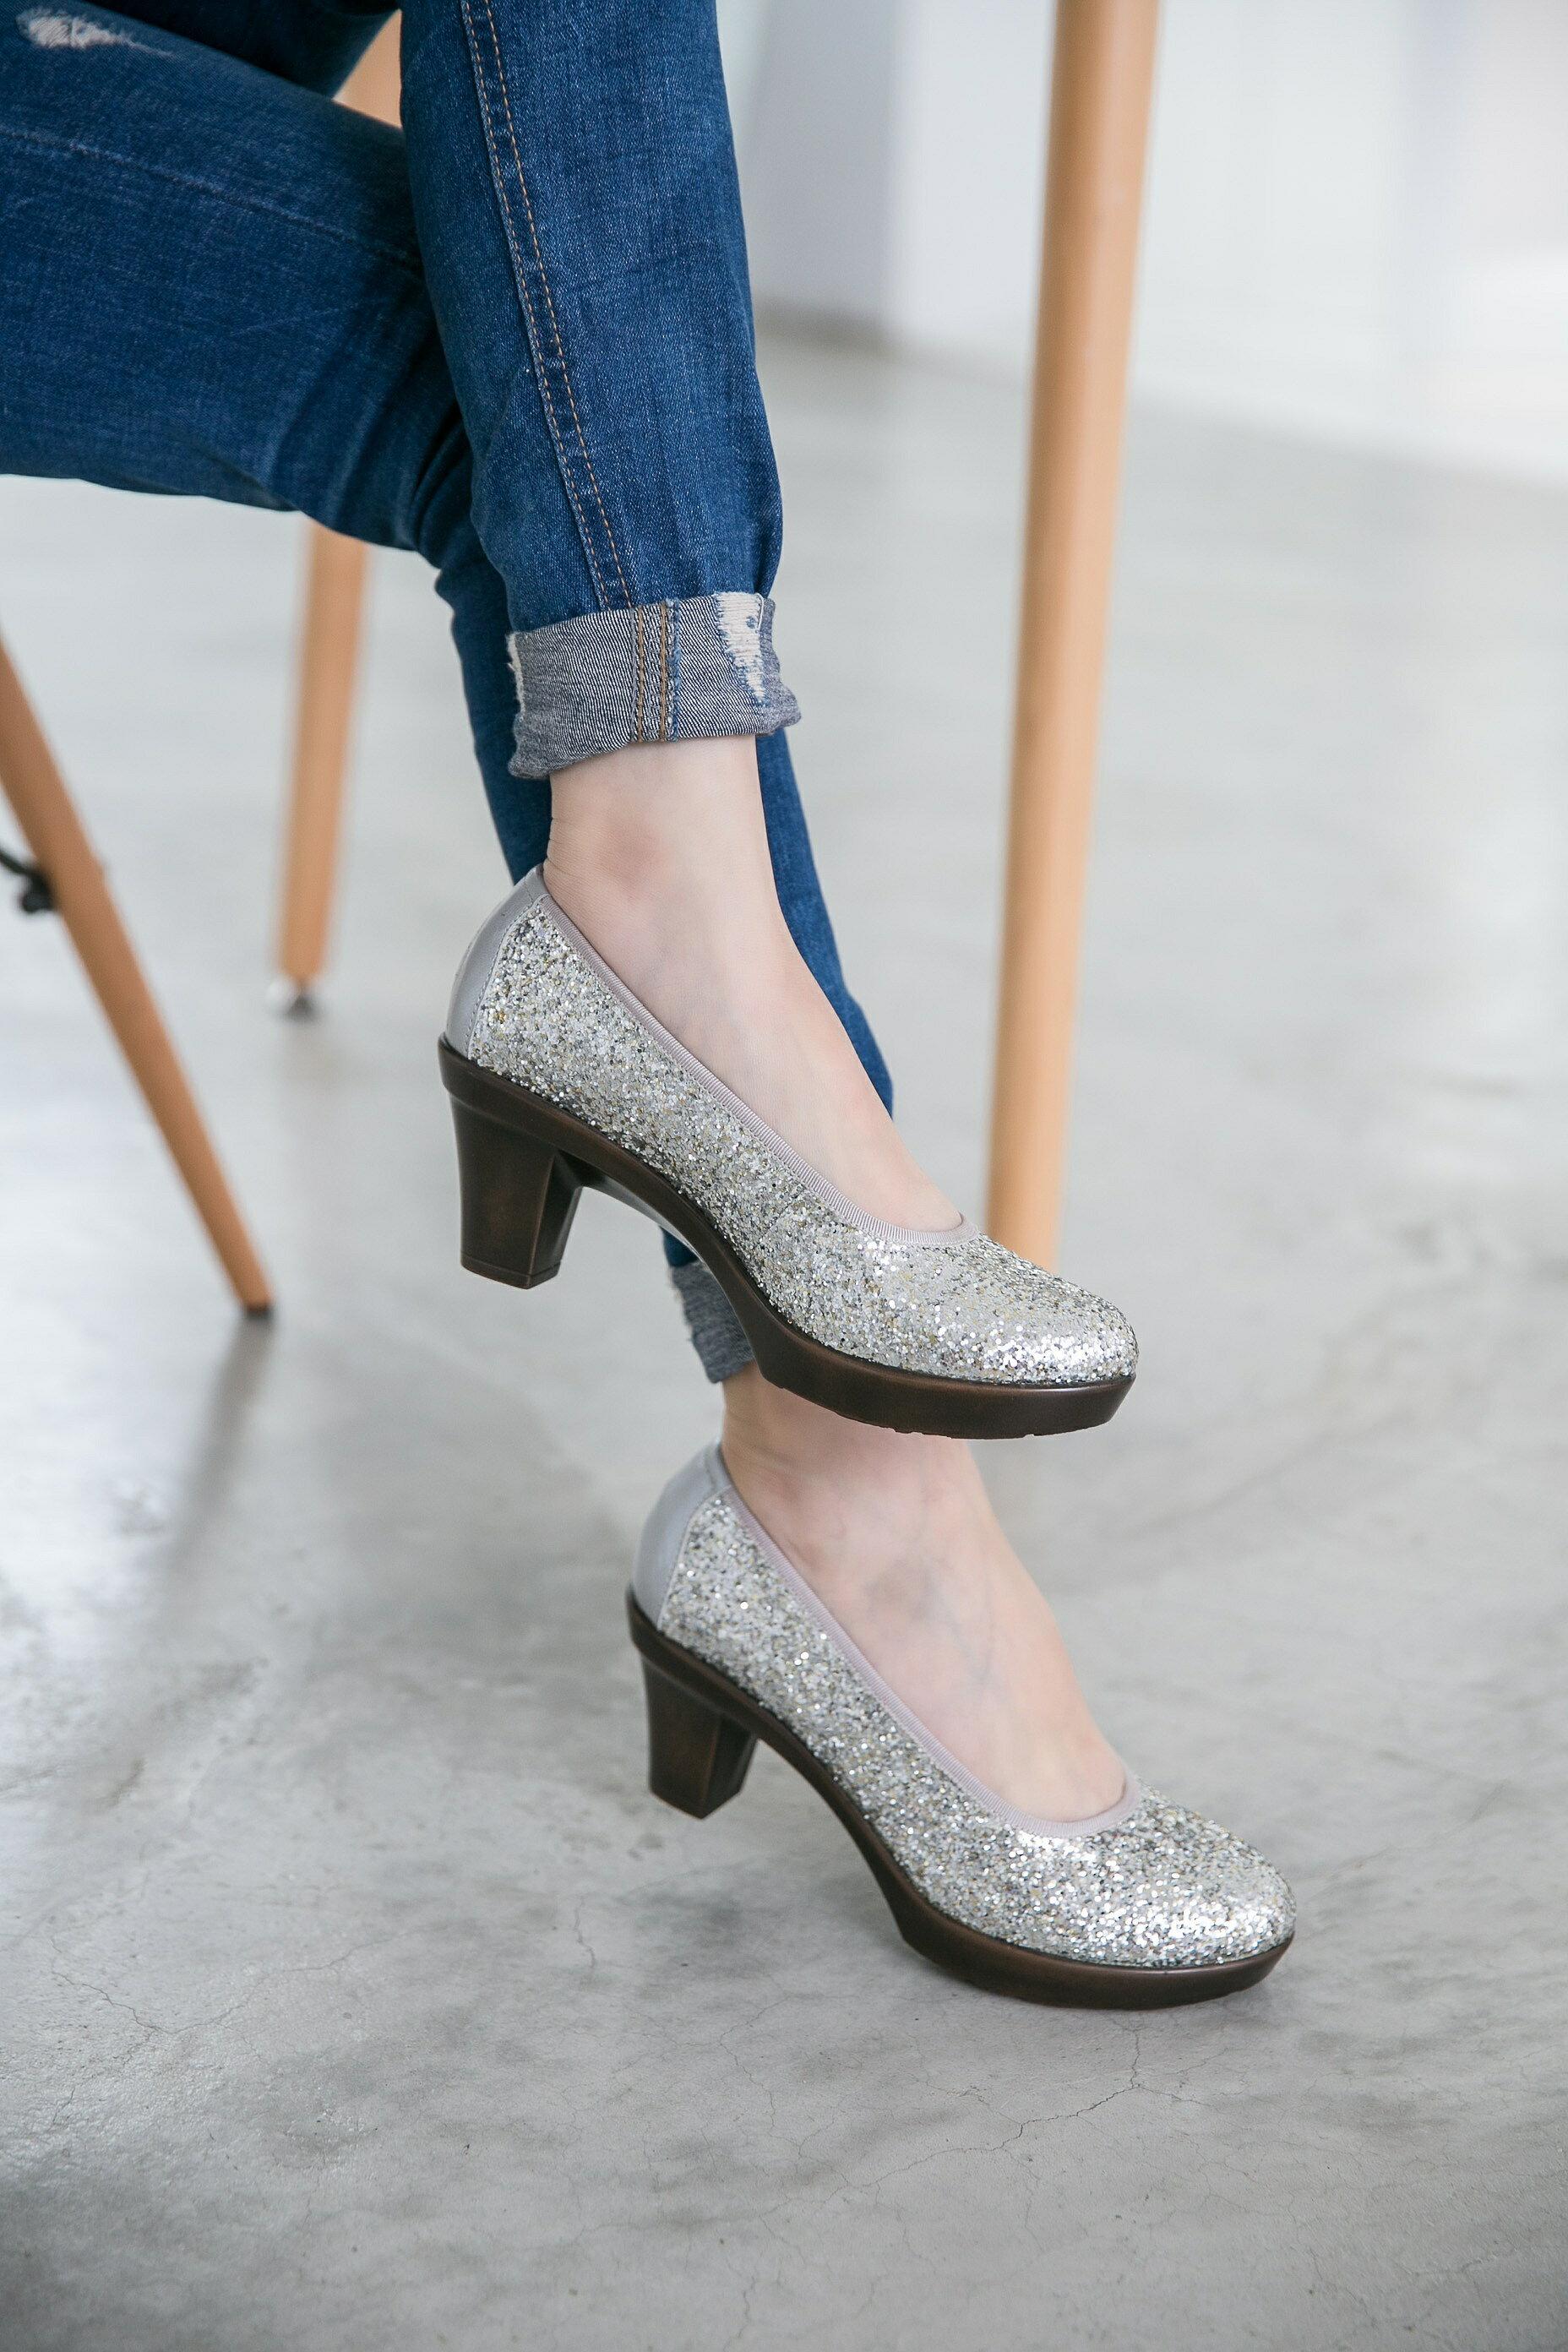 Aimez La Vie 舒適跟鞋 閃閃亮鑽約會Party厚底中跟鞋 0